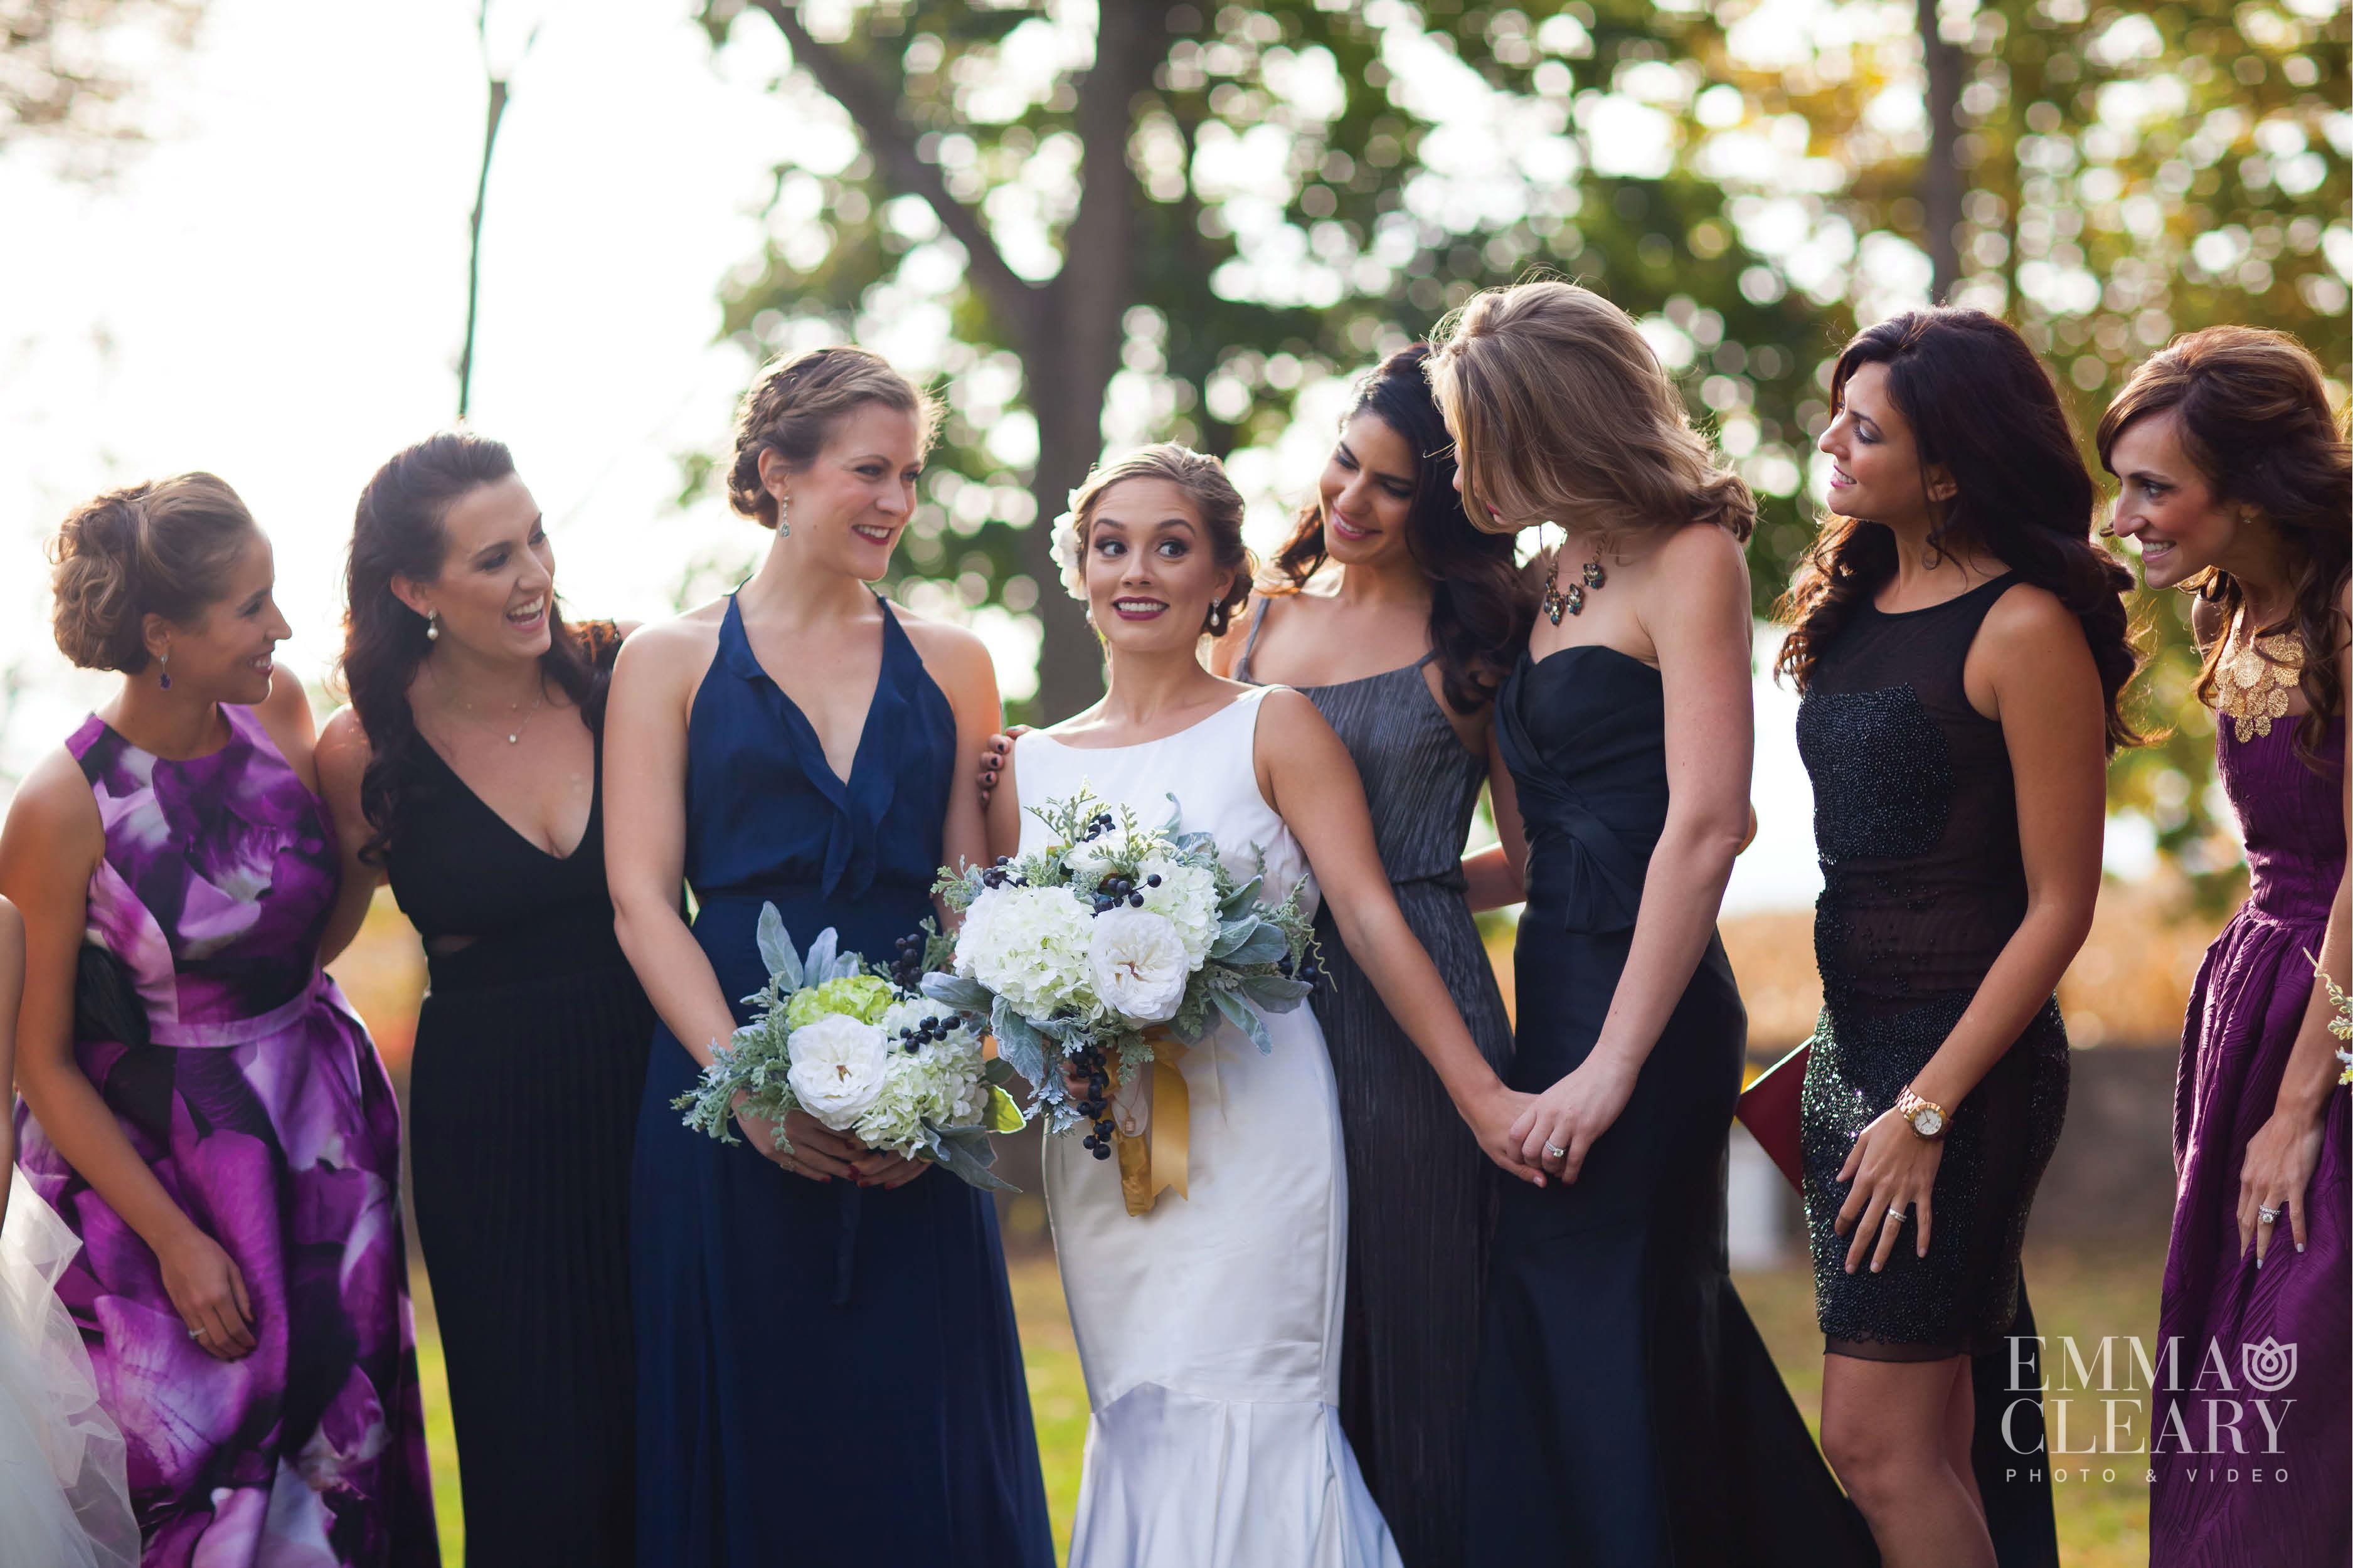 emma_cleary_photography-hotel-du-village-wedding11